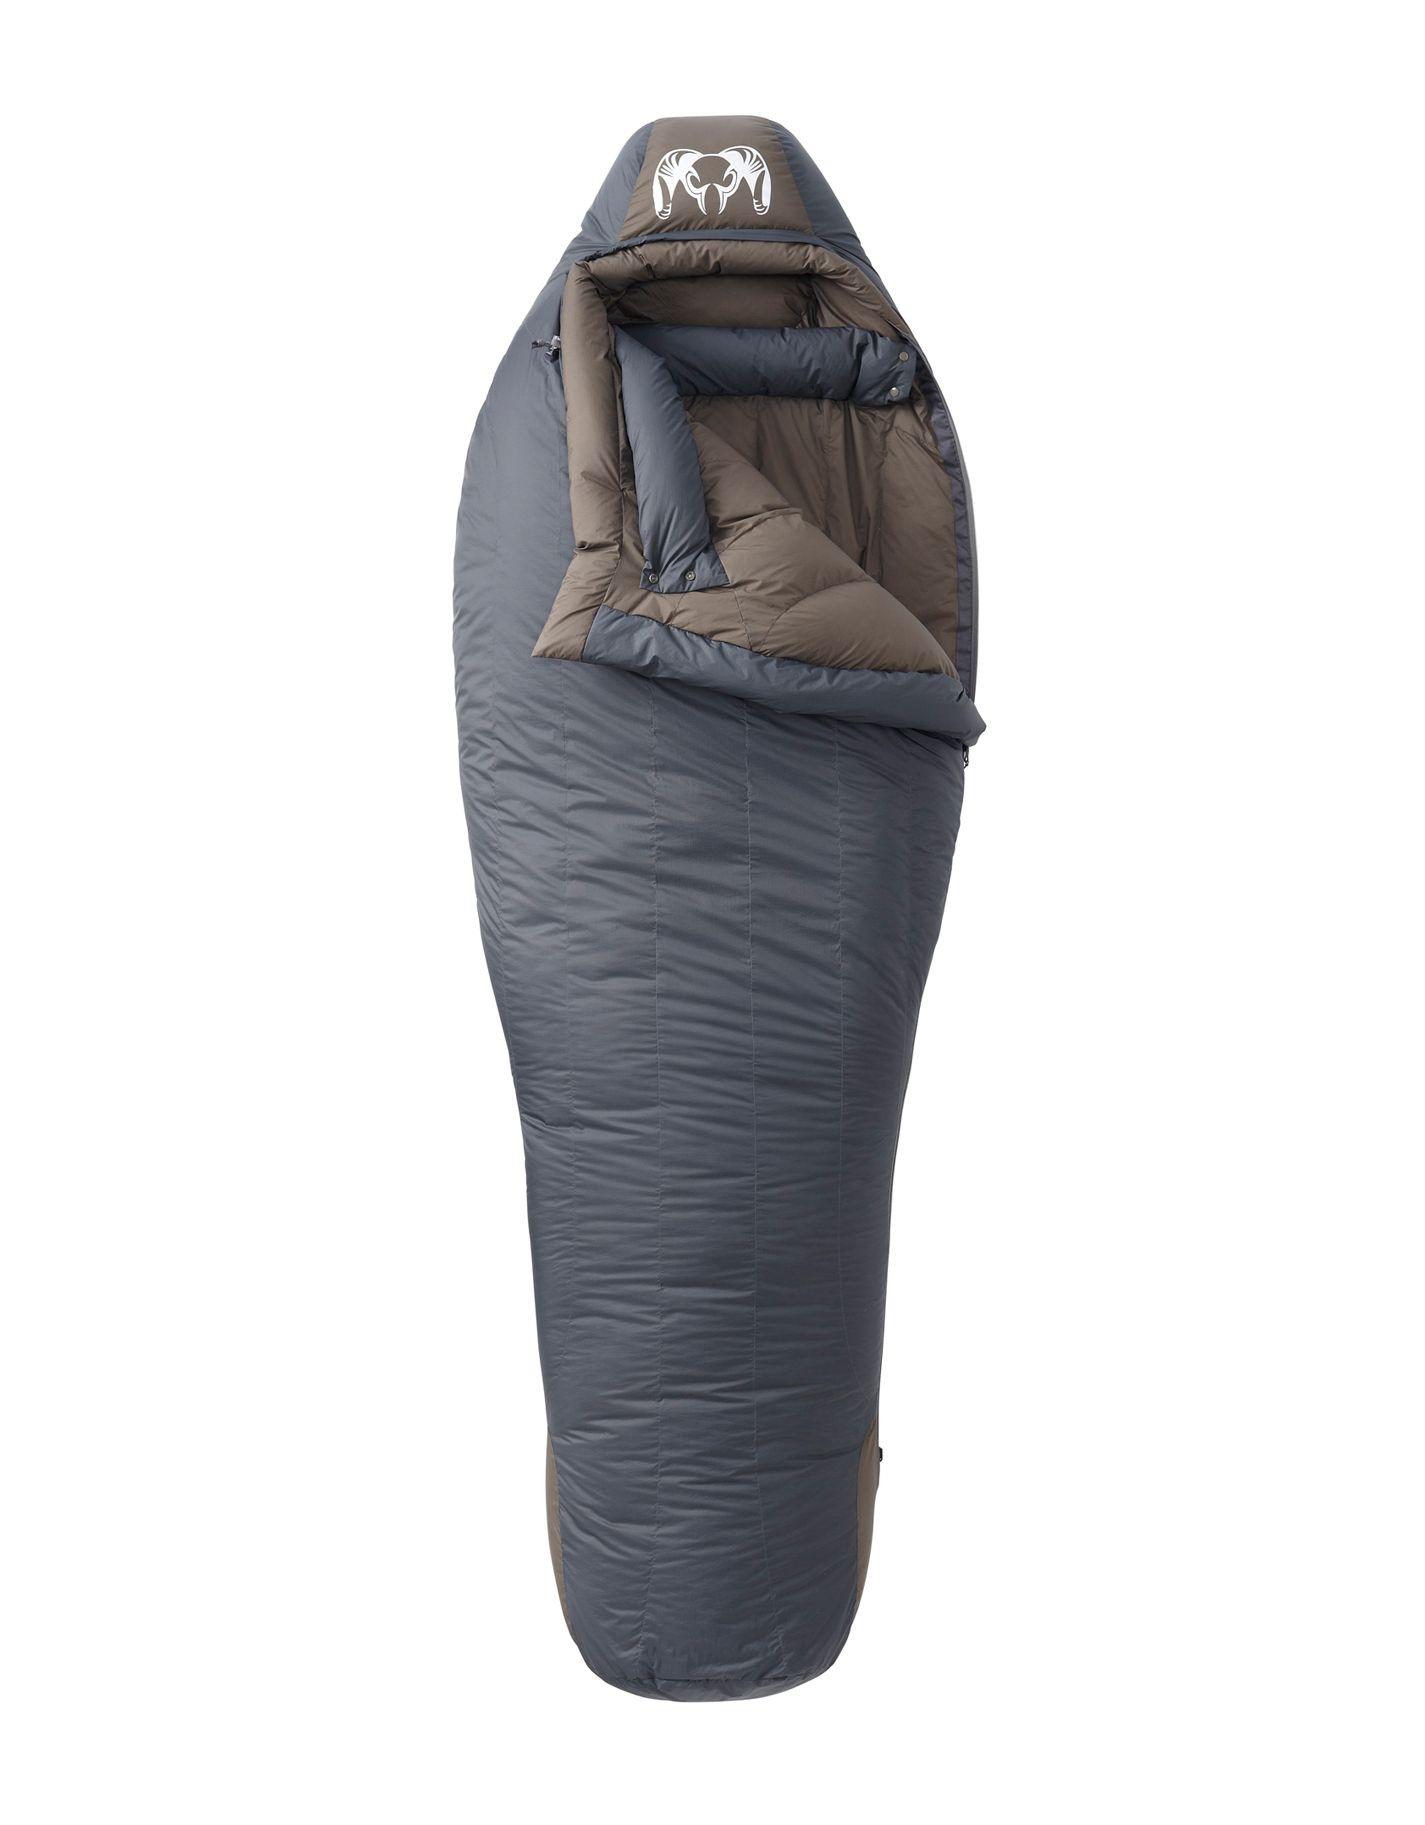 0 Down Hunting Sleeping Bag